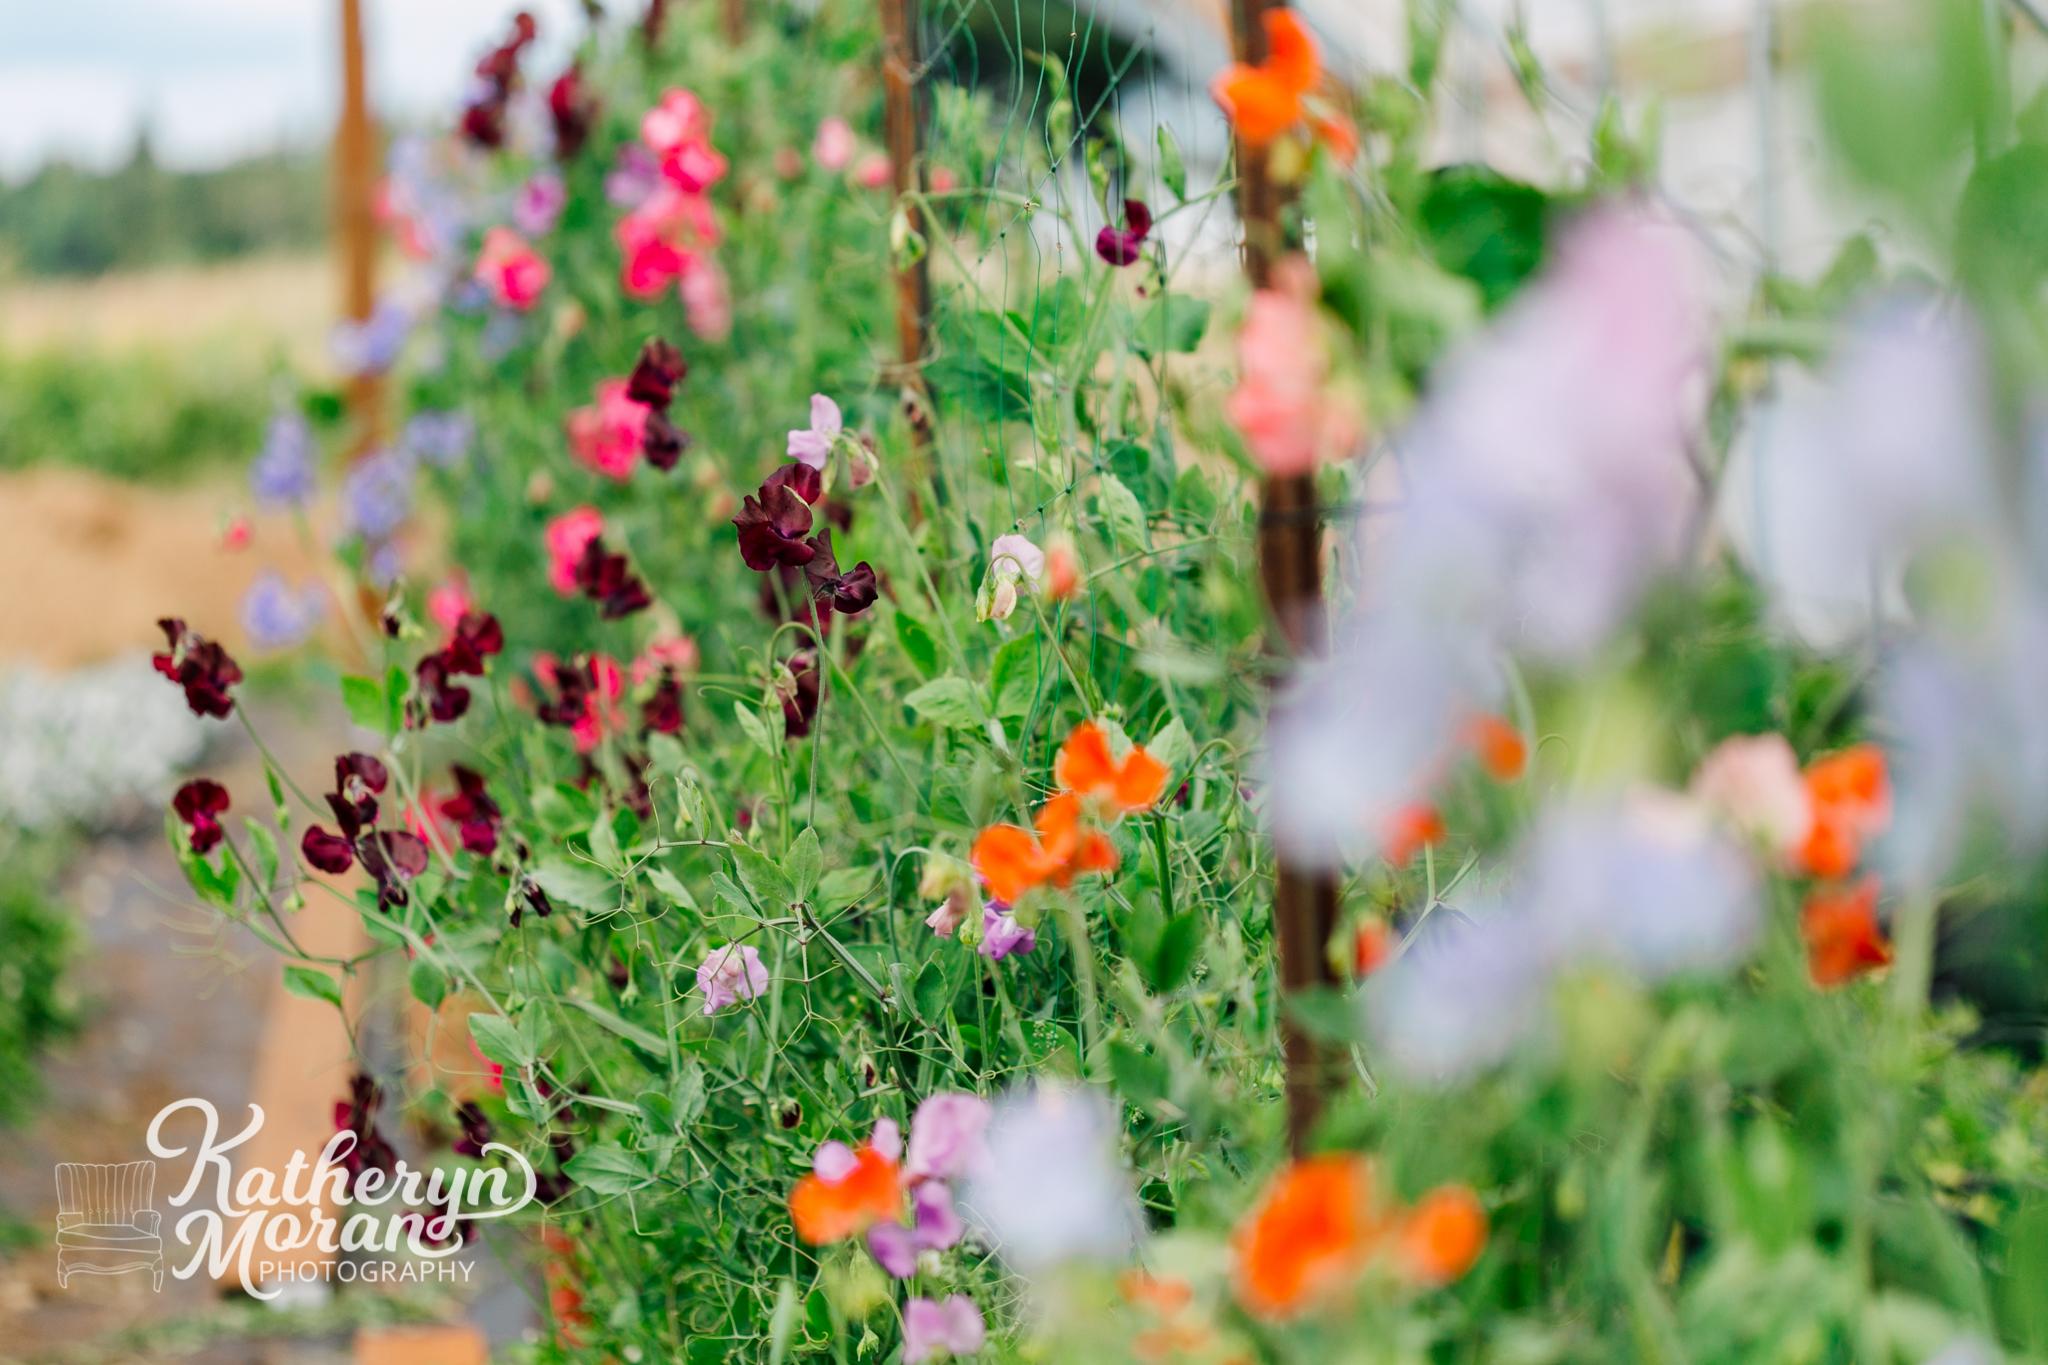 bellingham-photographer-triple-wren-farms-katheryn-moran-photography-summer-2018-458.jpg